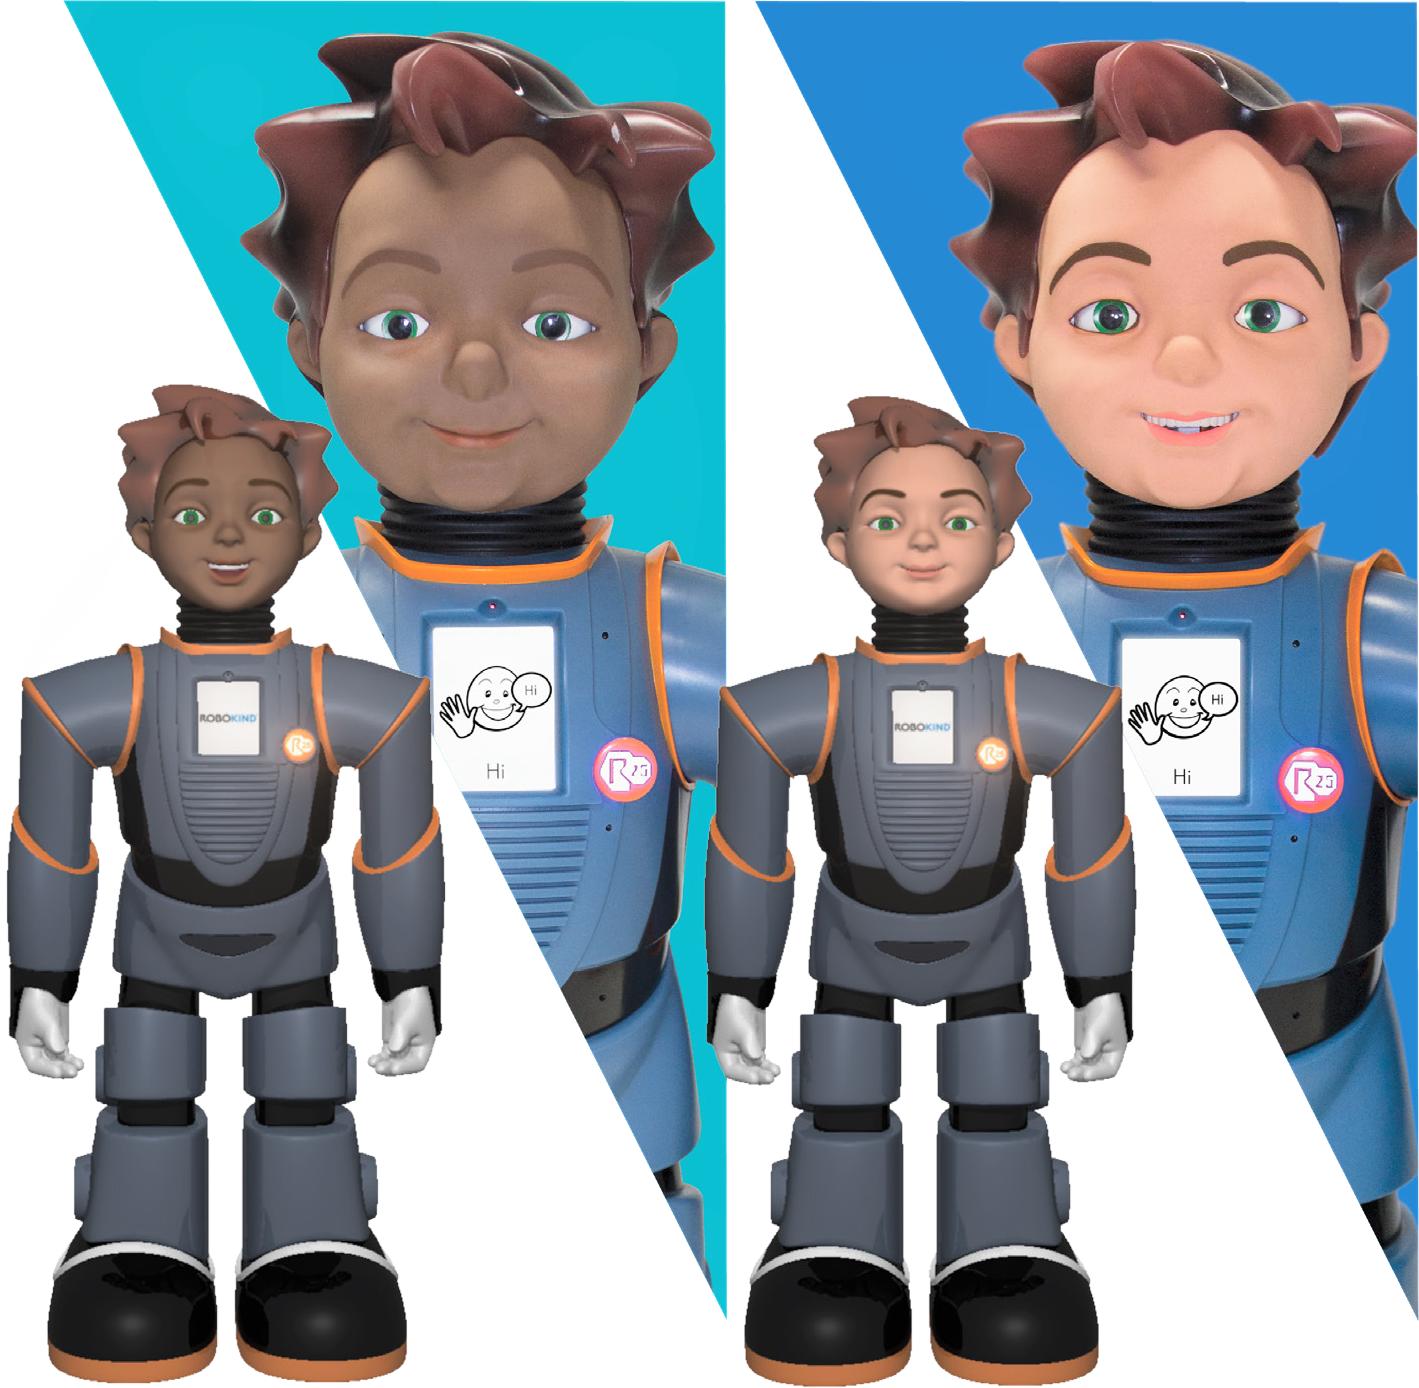 Bots Avatars